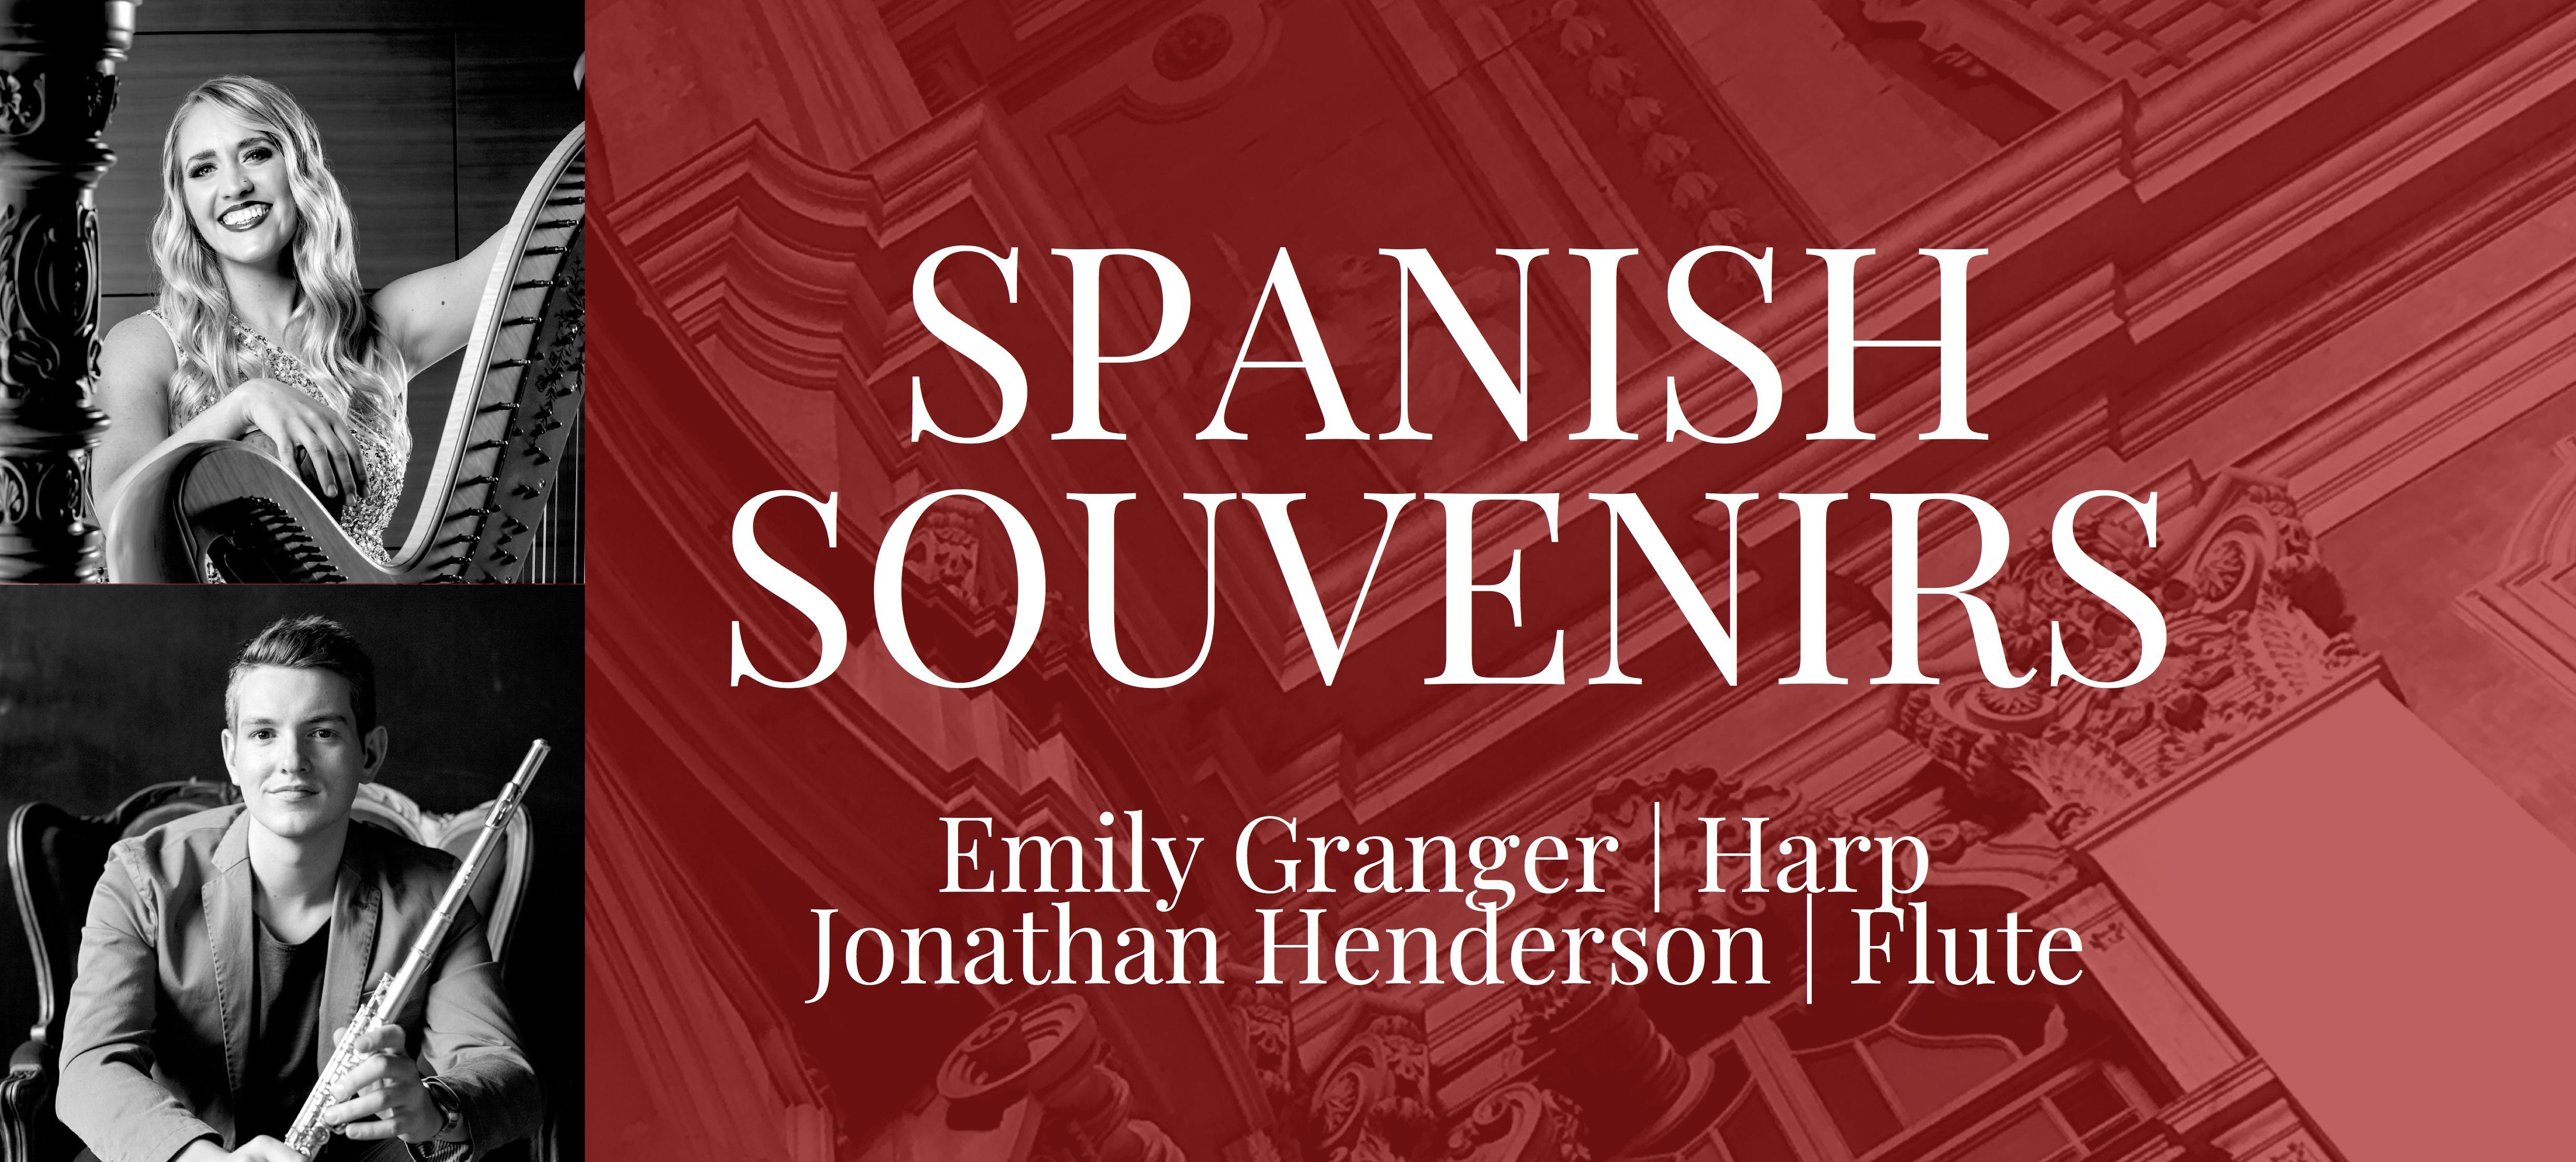 SPANISH SOUVENIRS: Emily Granger & Jonathan Henderson / Mosman (Sydney)